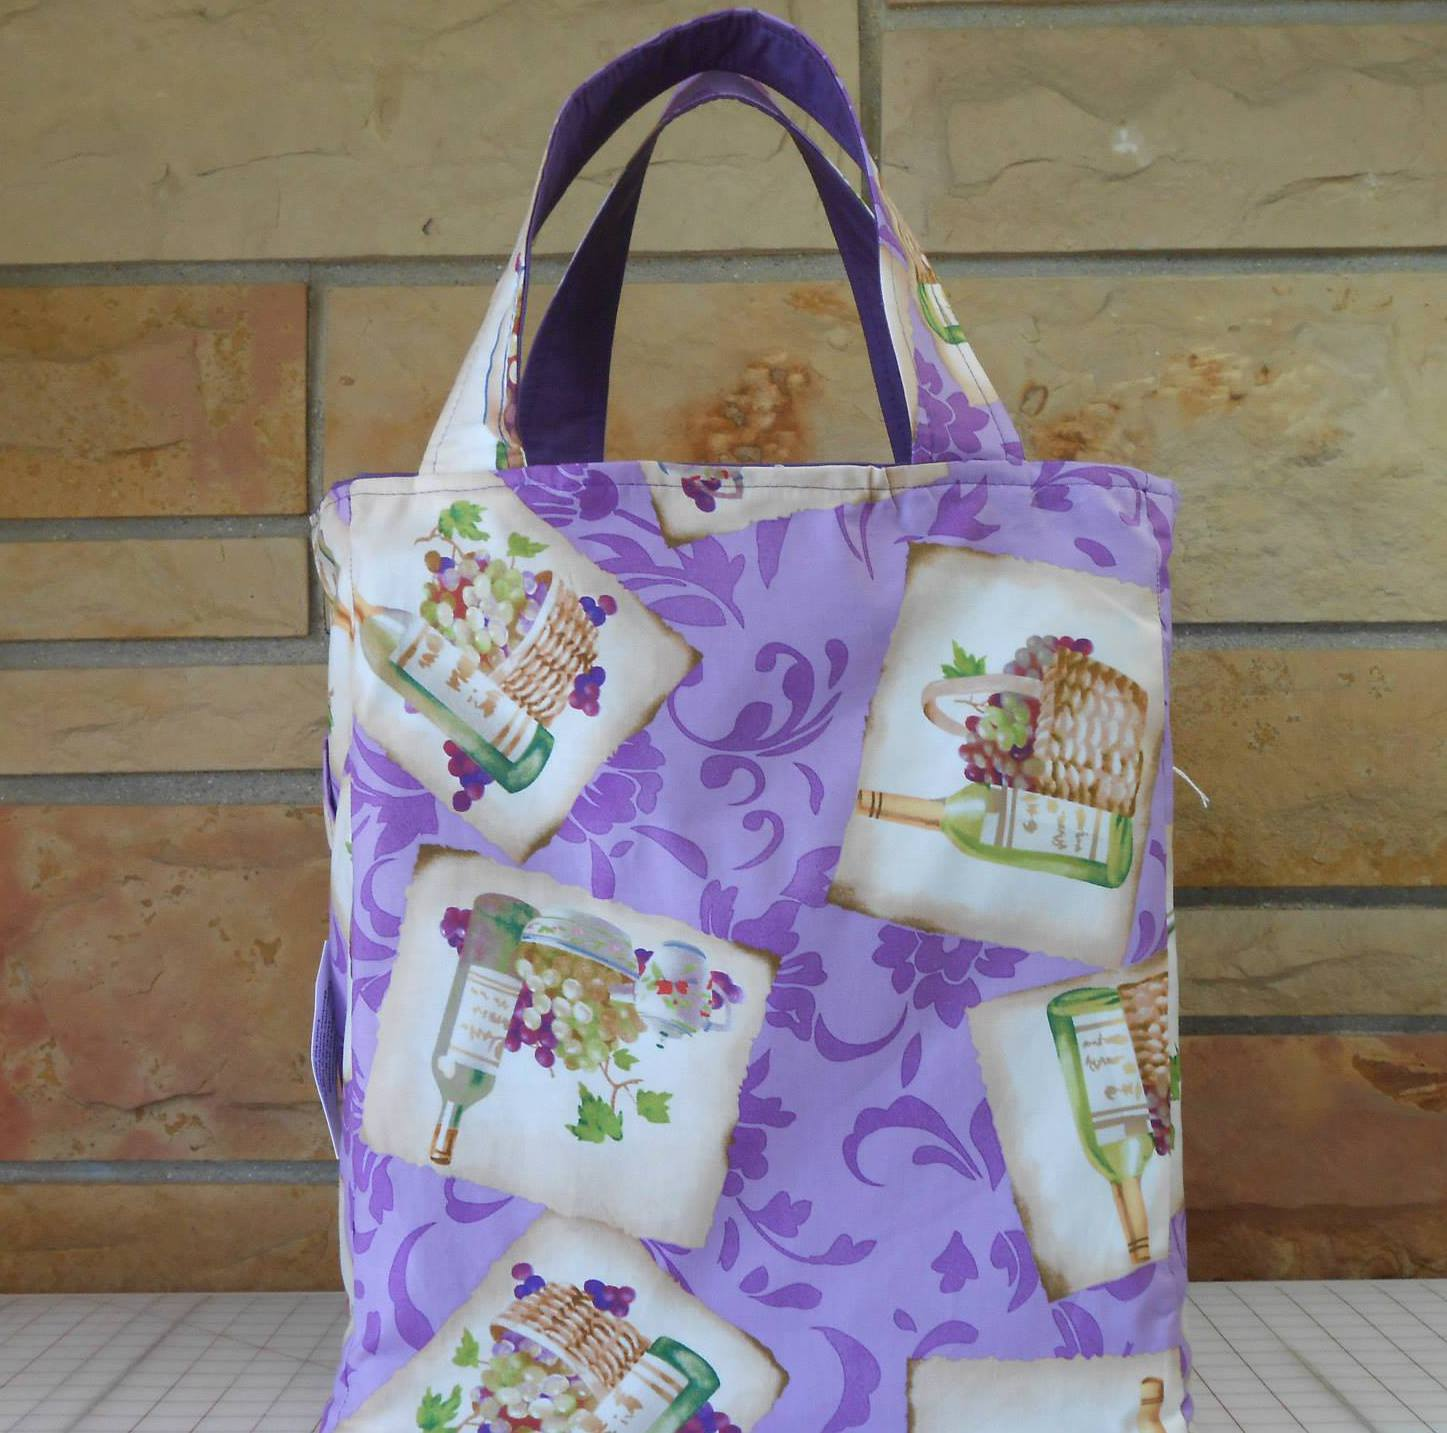 Handbags - The Bag Lady